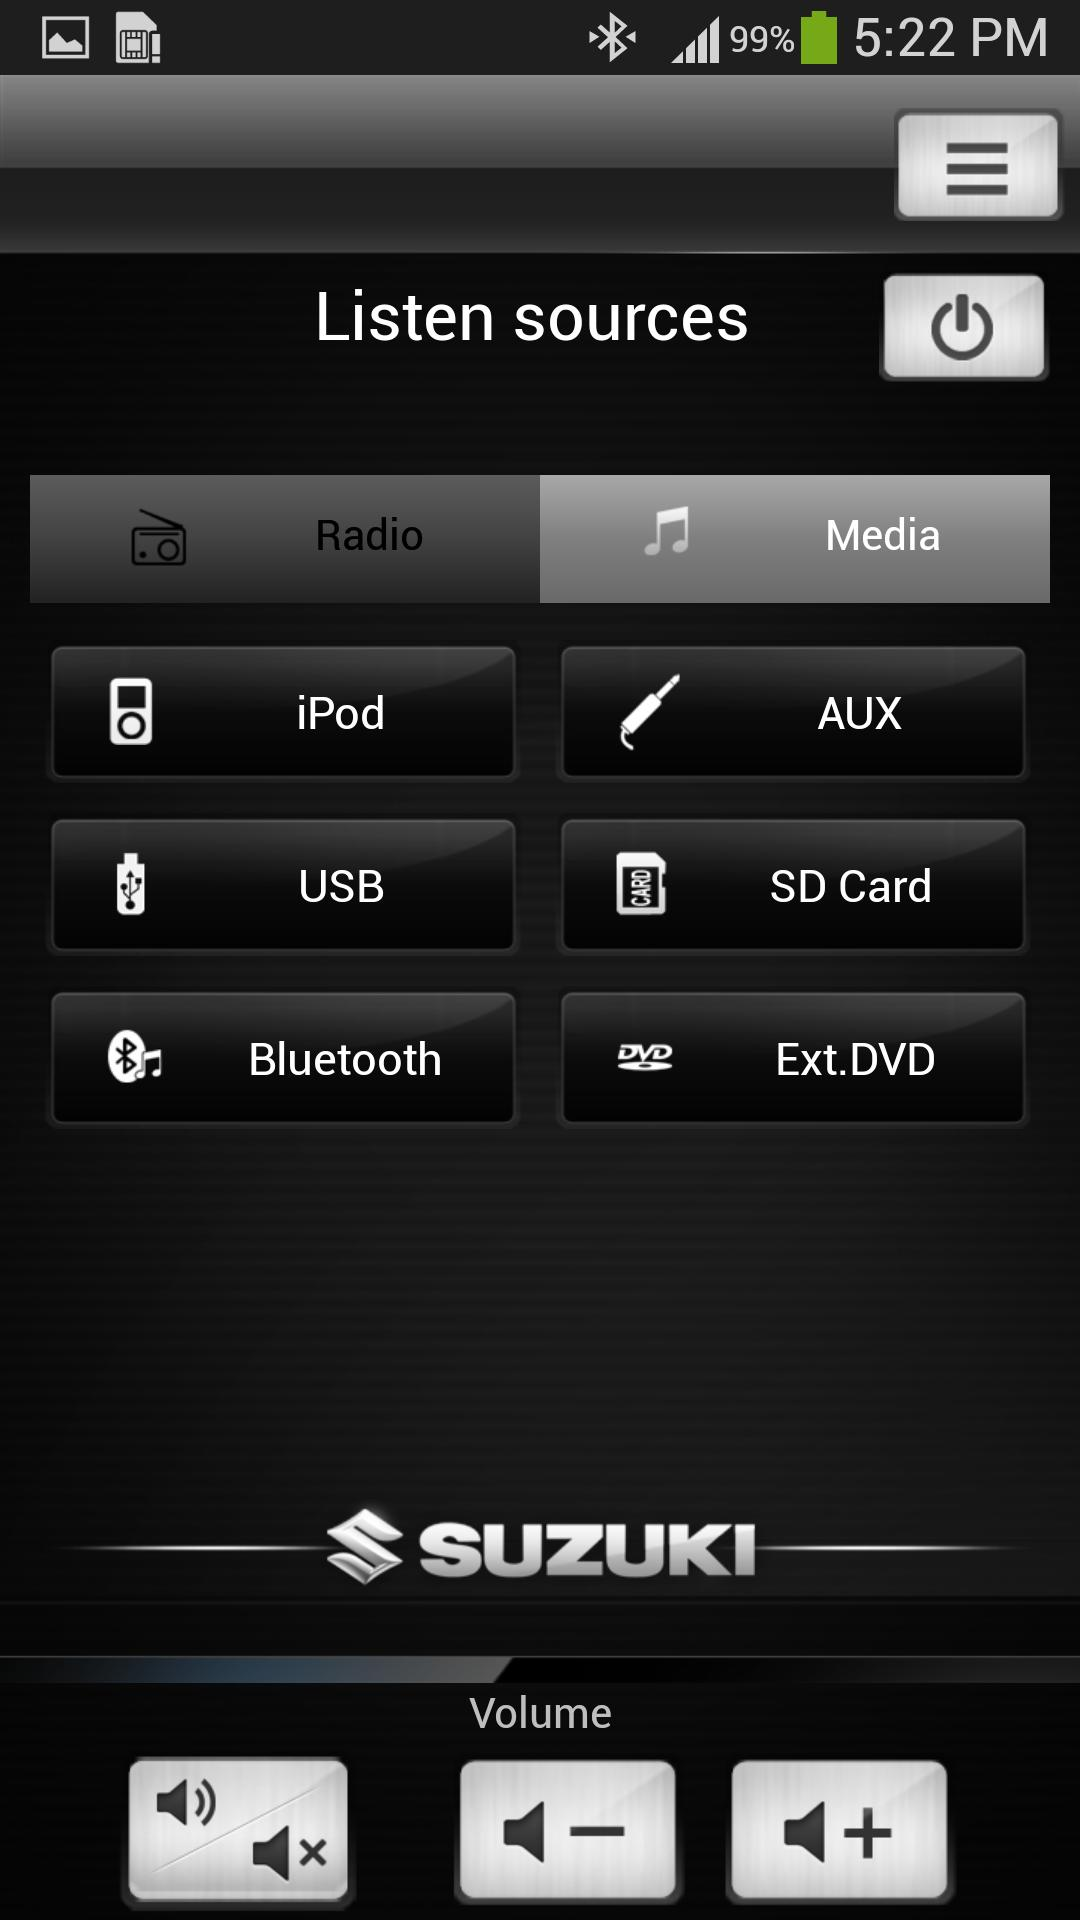 Suzuki Remote Control App for Android - APK Download